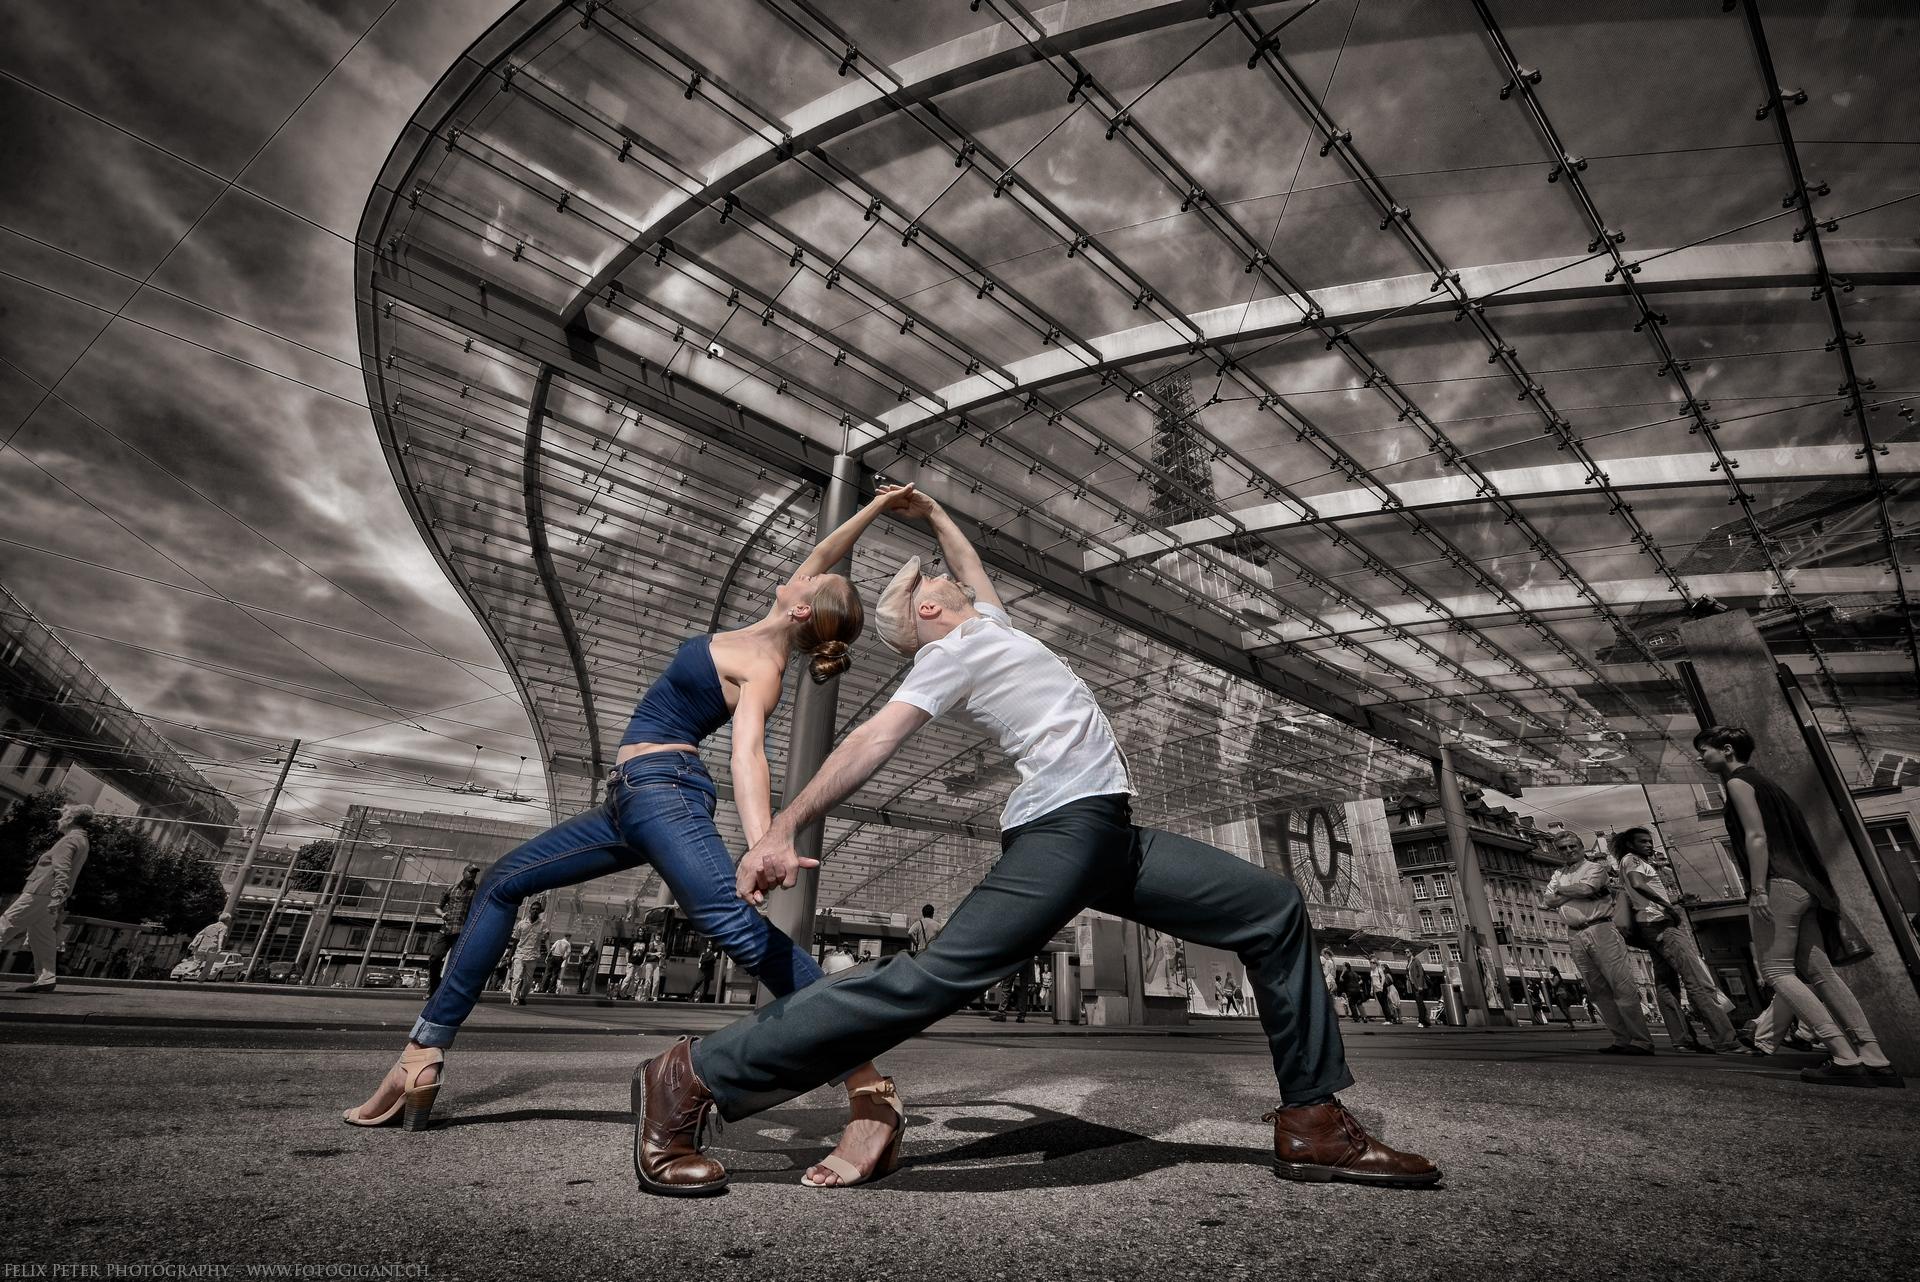 Felix-Peter-Yoga-Pilates-Dance-Fotografie_Bern_037.jpg